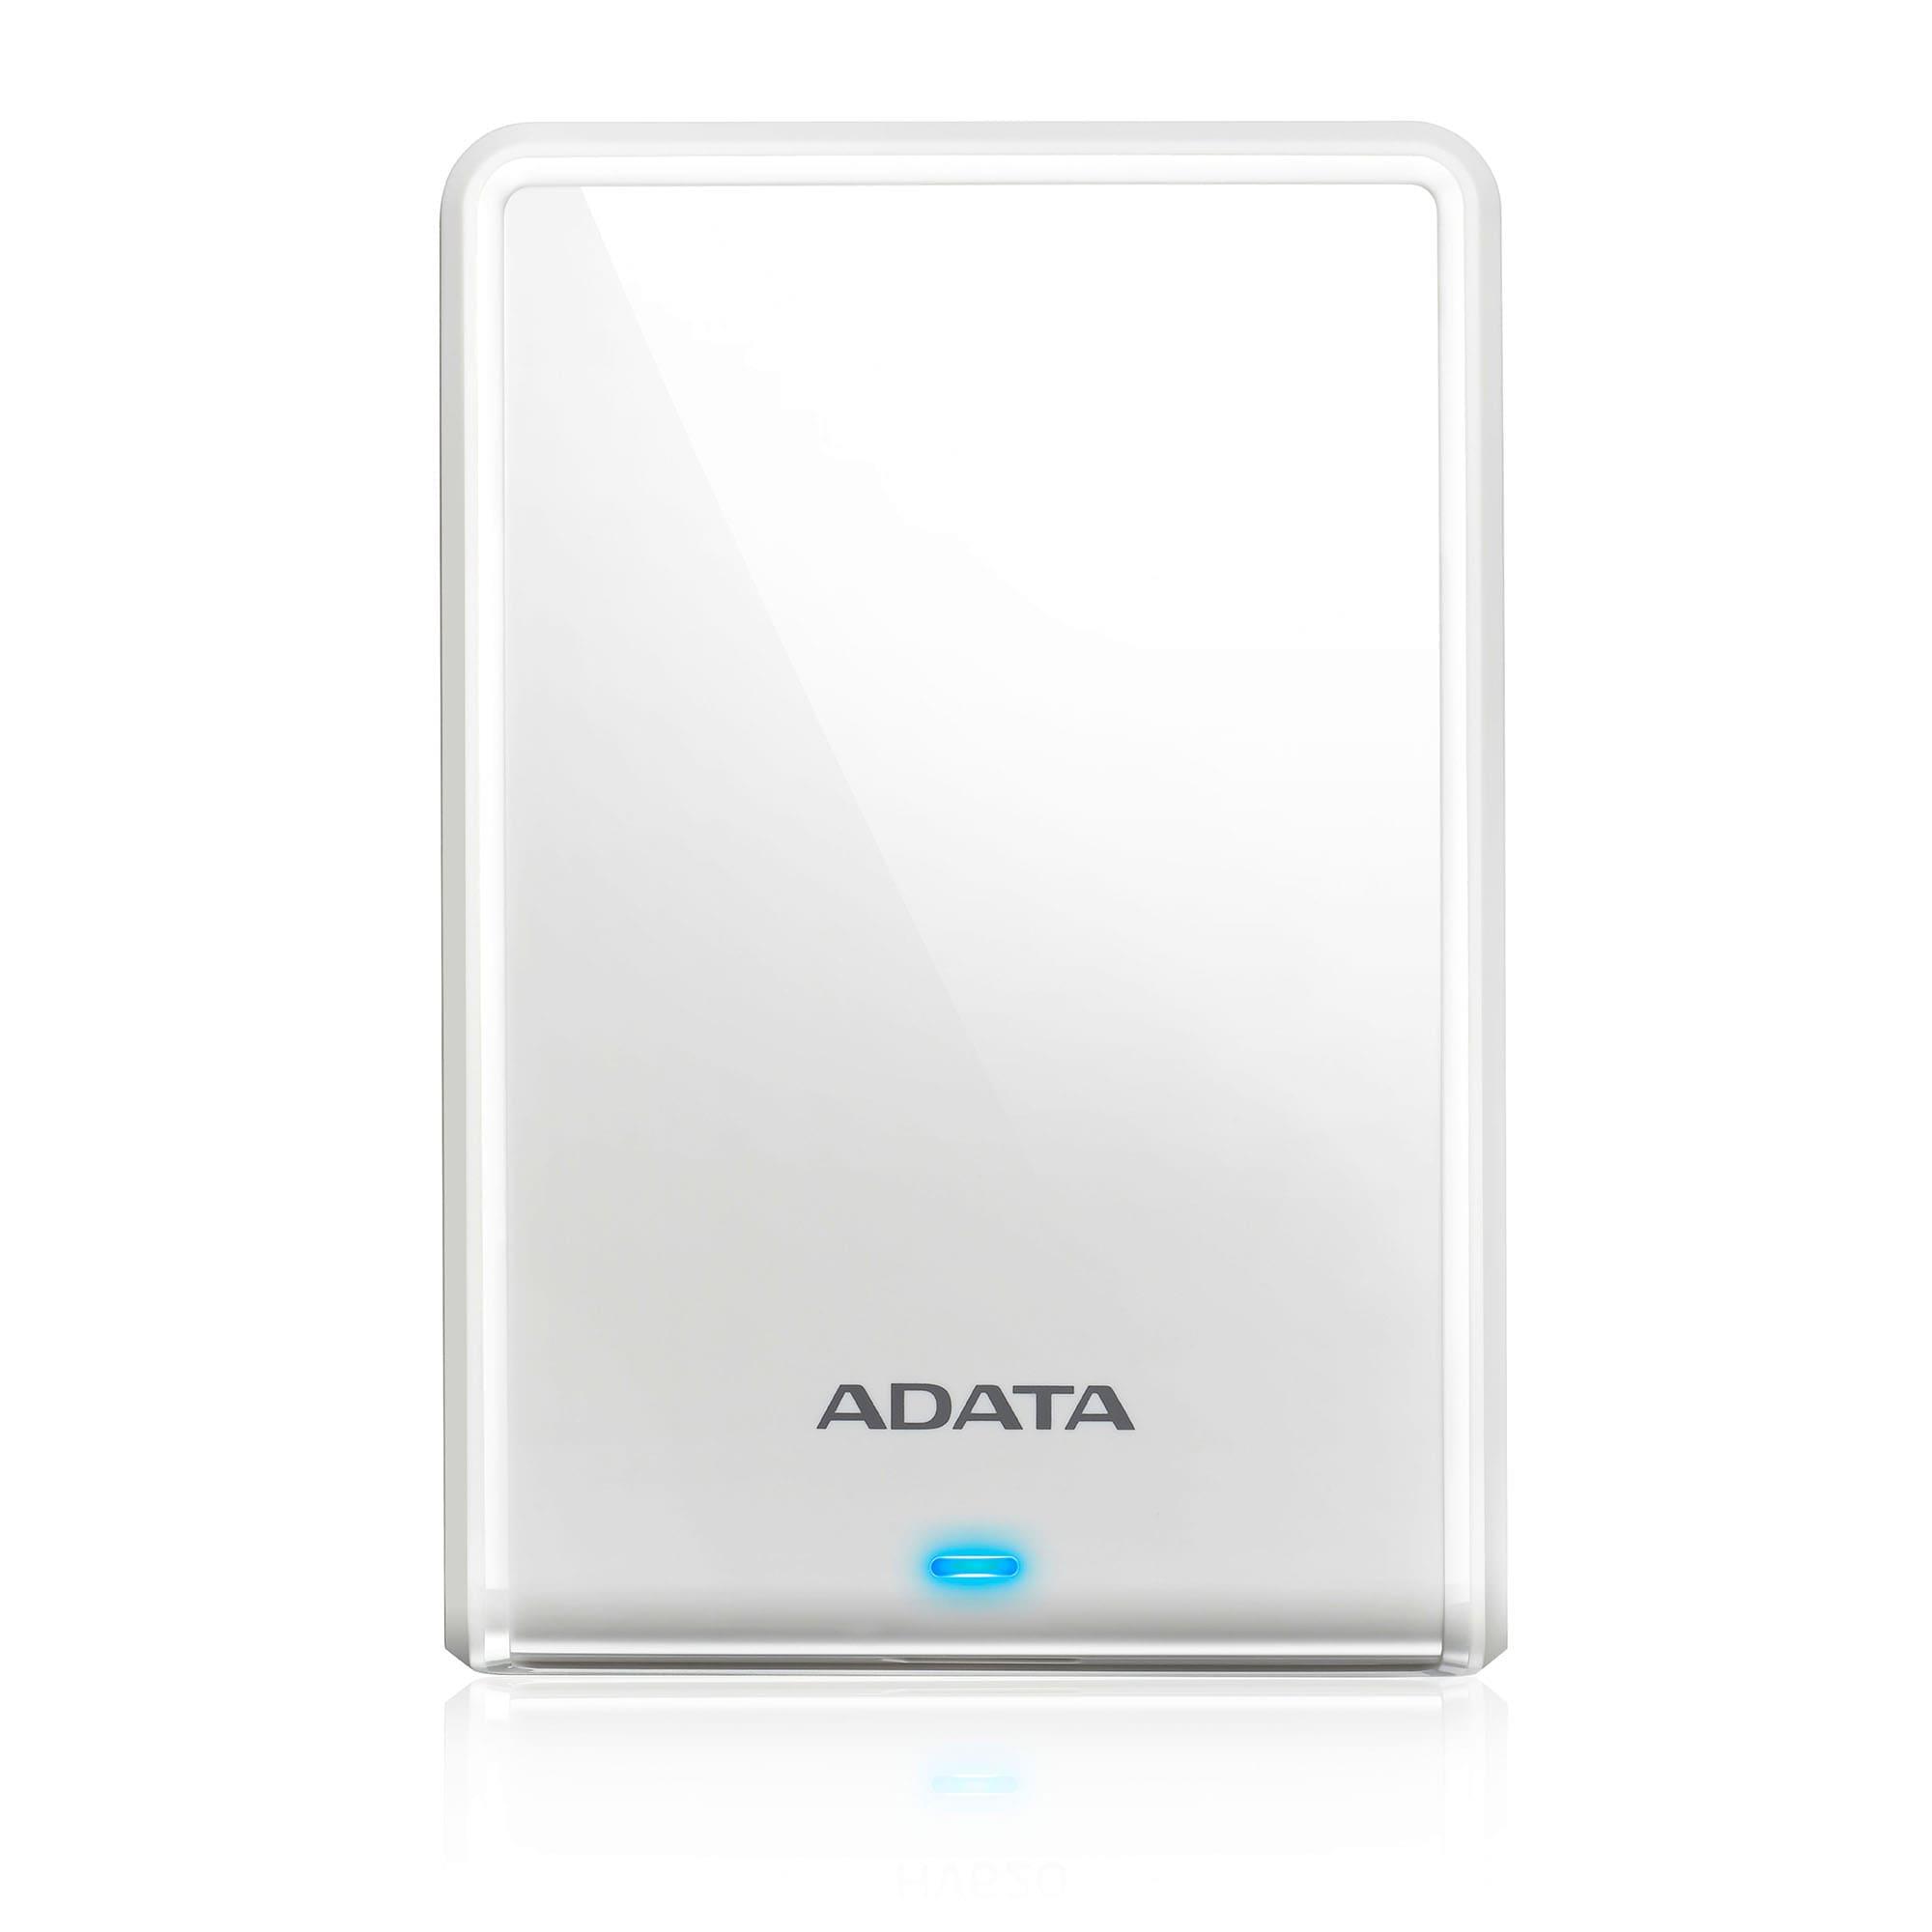 【滿3千10%回饋】ADATA 威剛 HV620S 1TB(白) 2.5吋行動硬碟